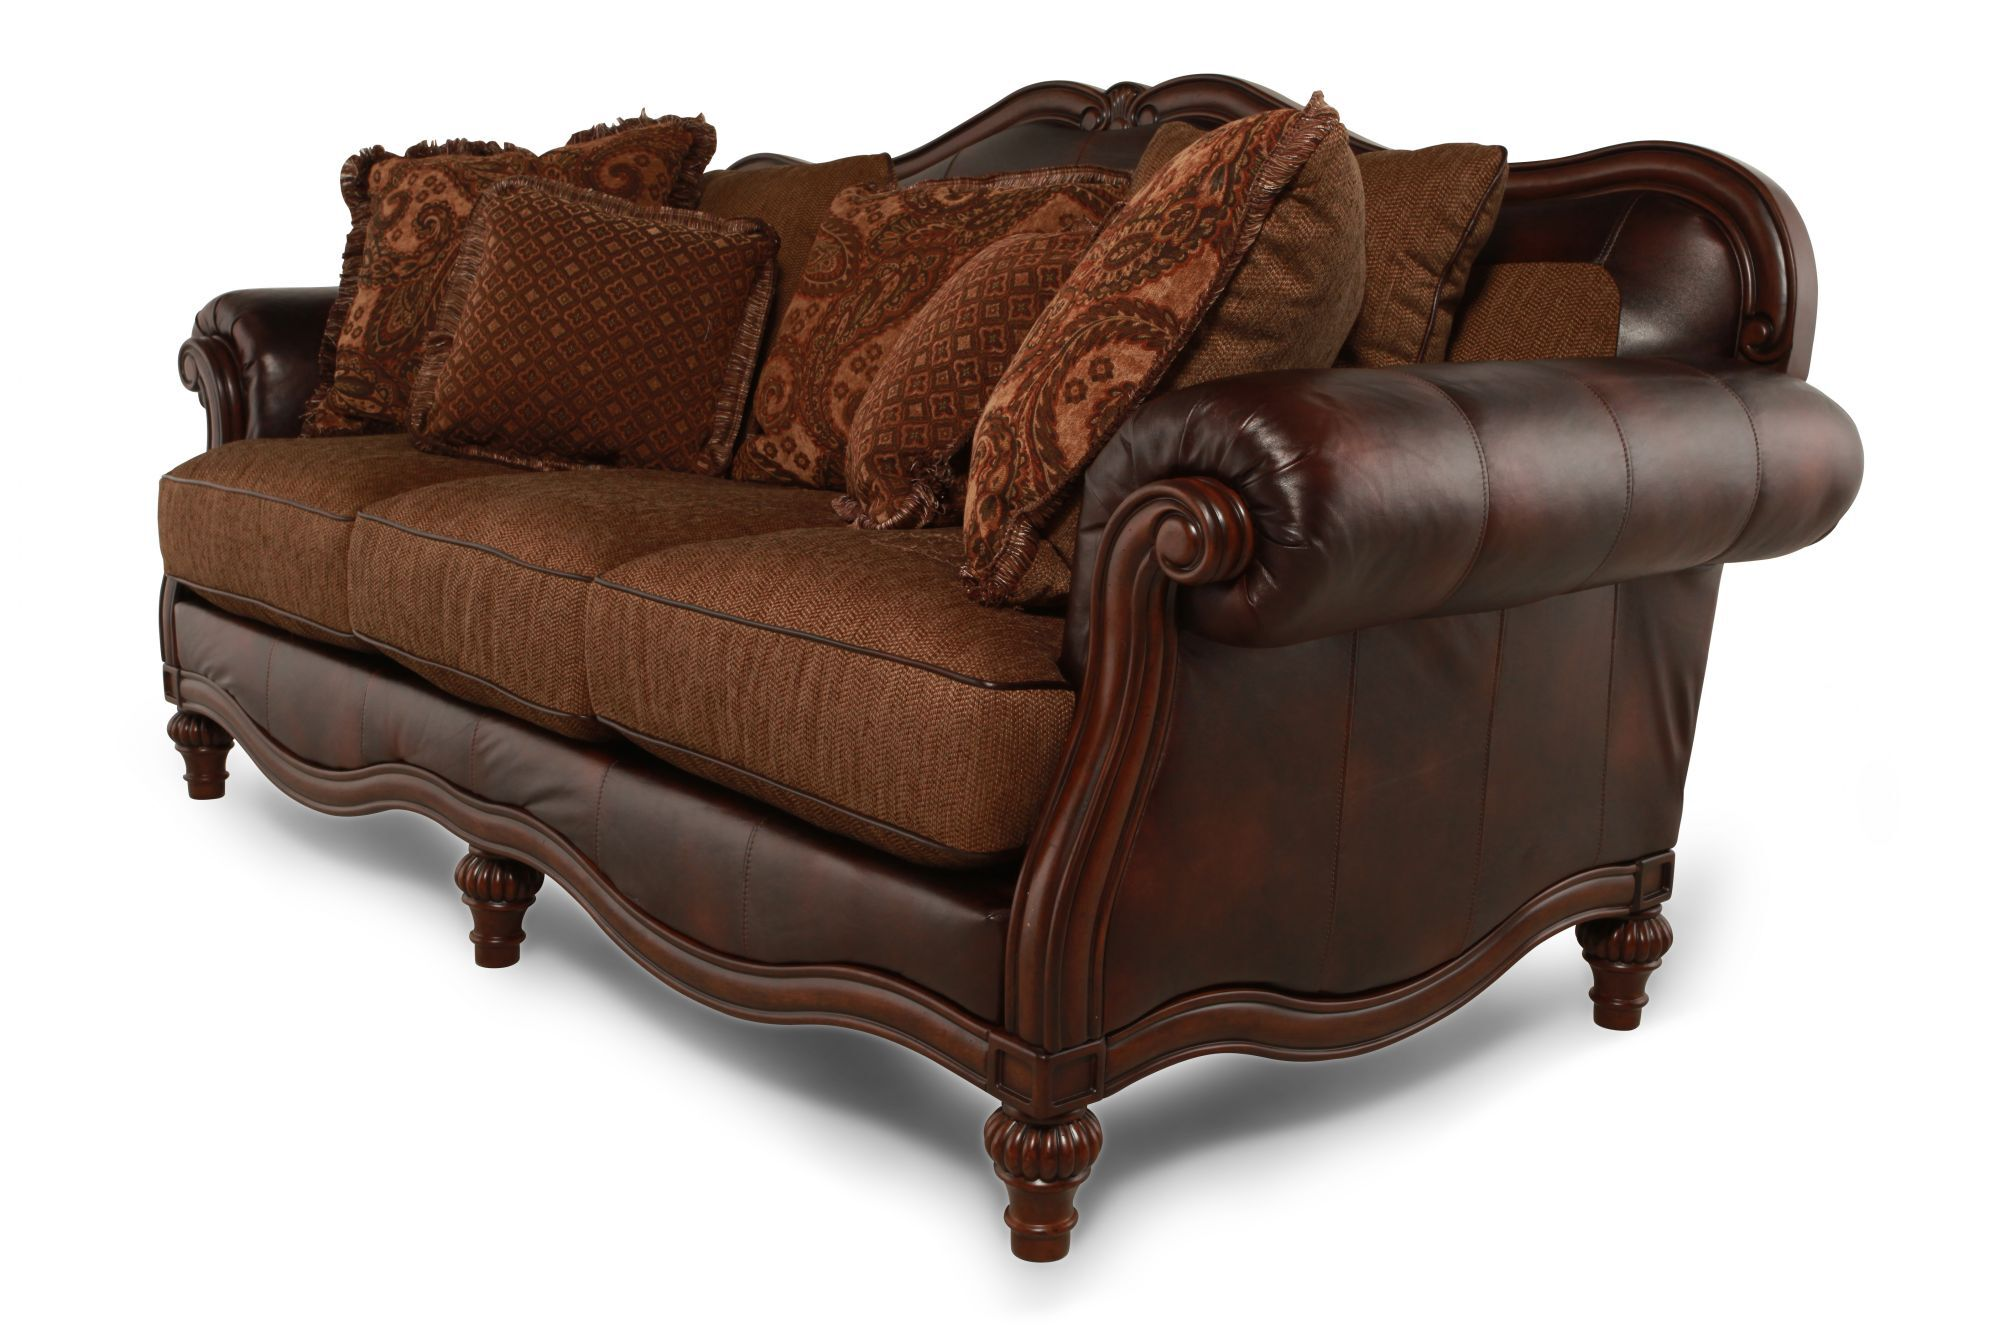 Amazing Traditional 91u0026quot; Rolled Arm Sofa ...